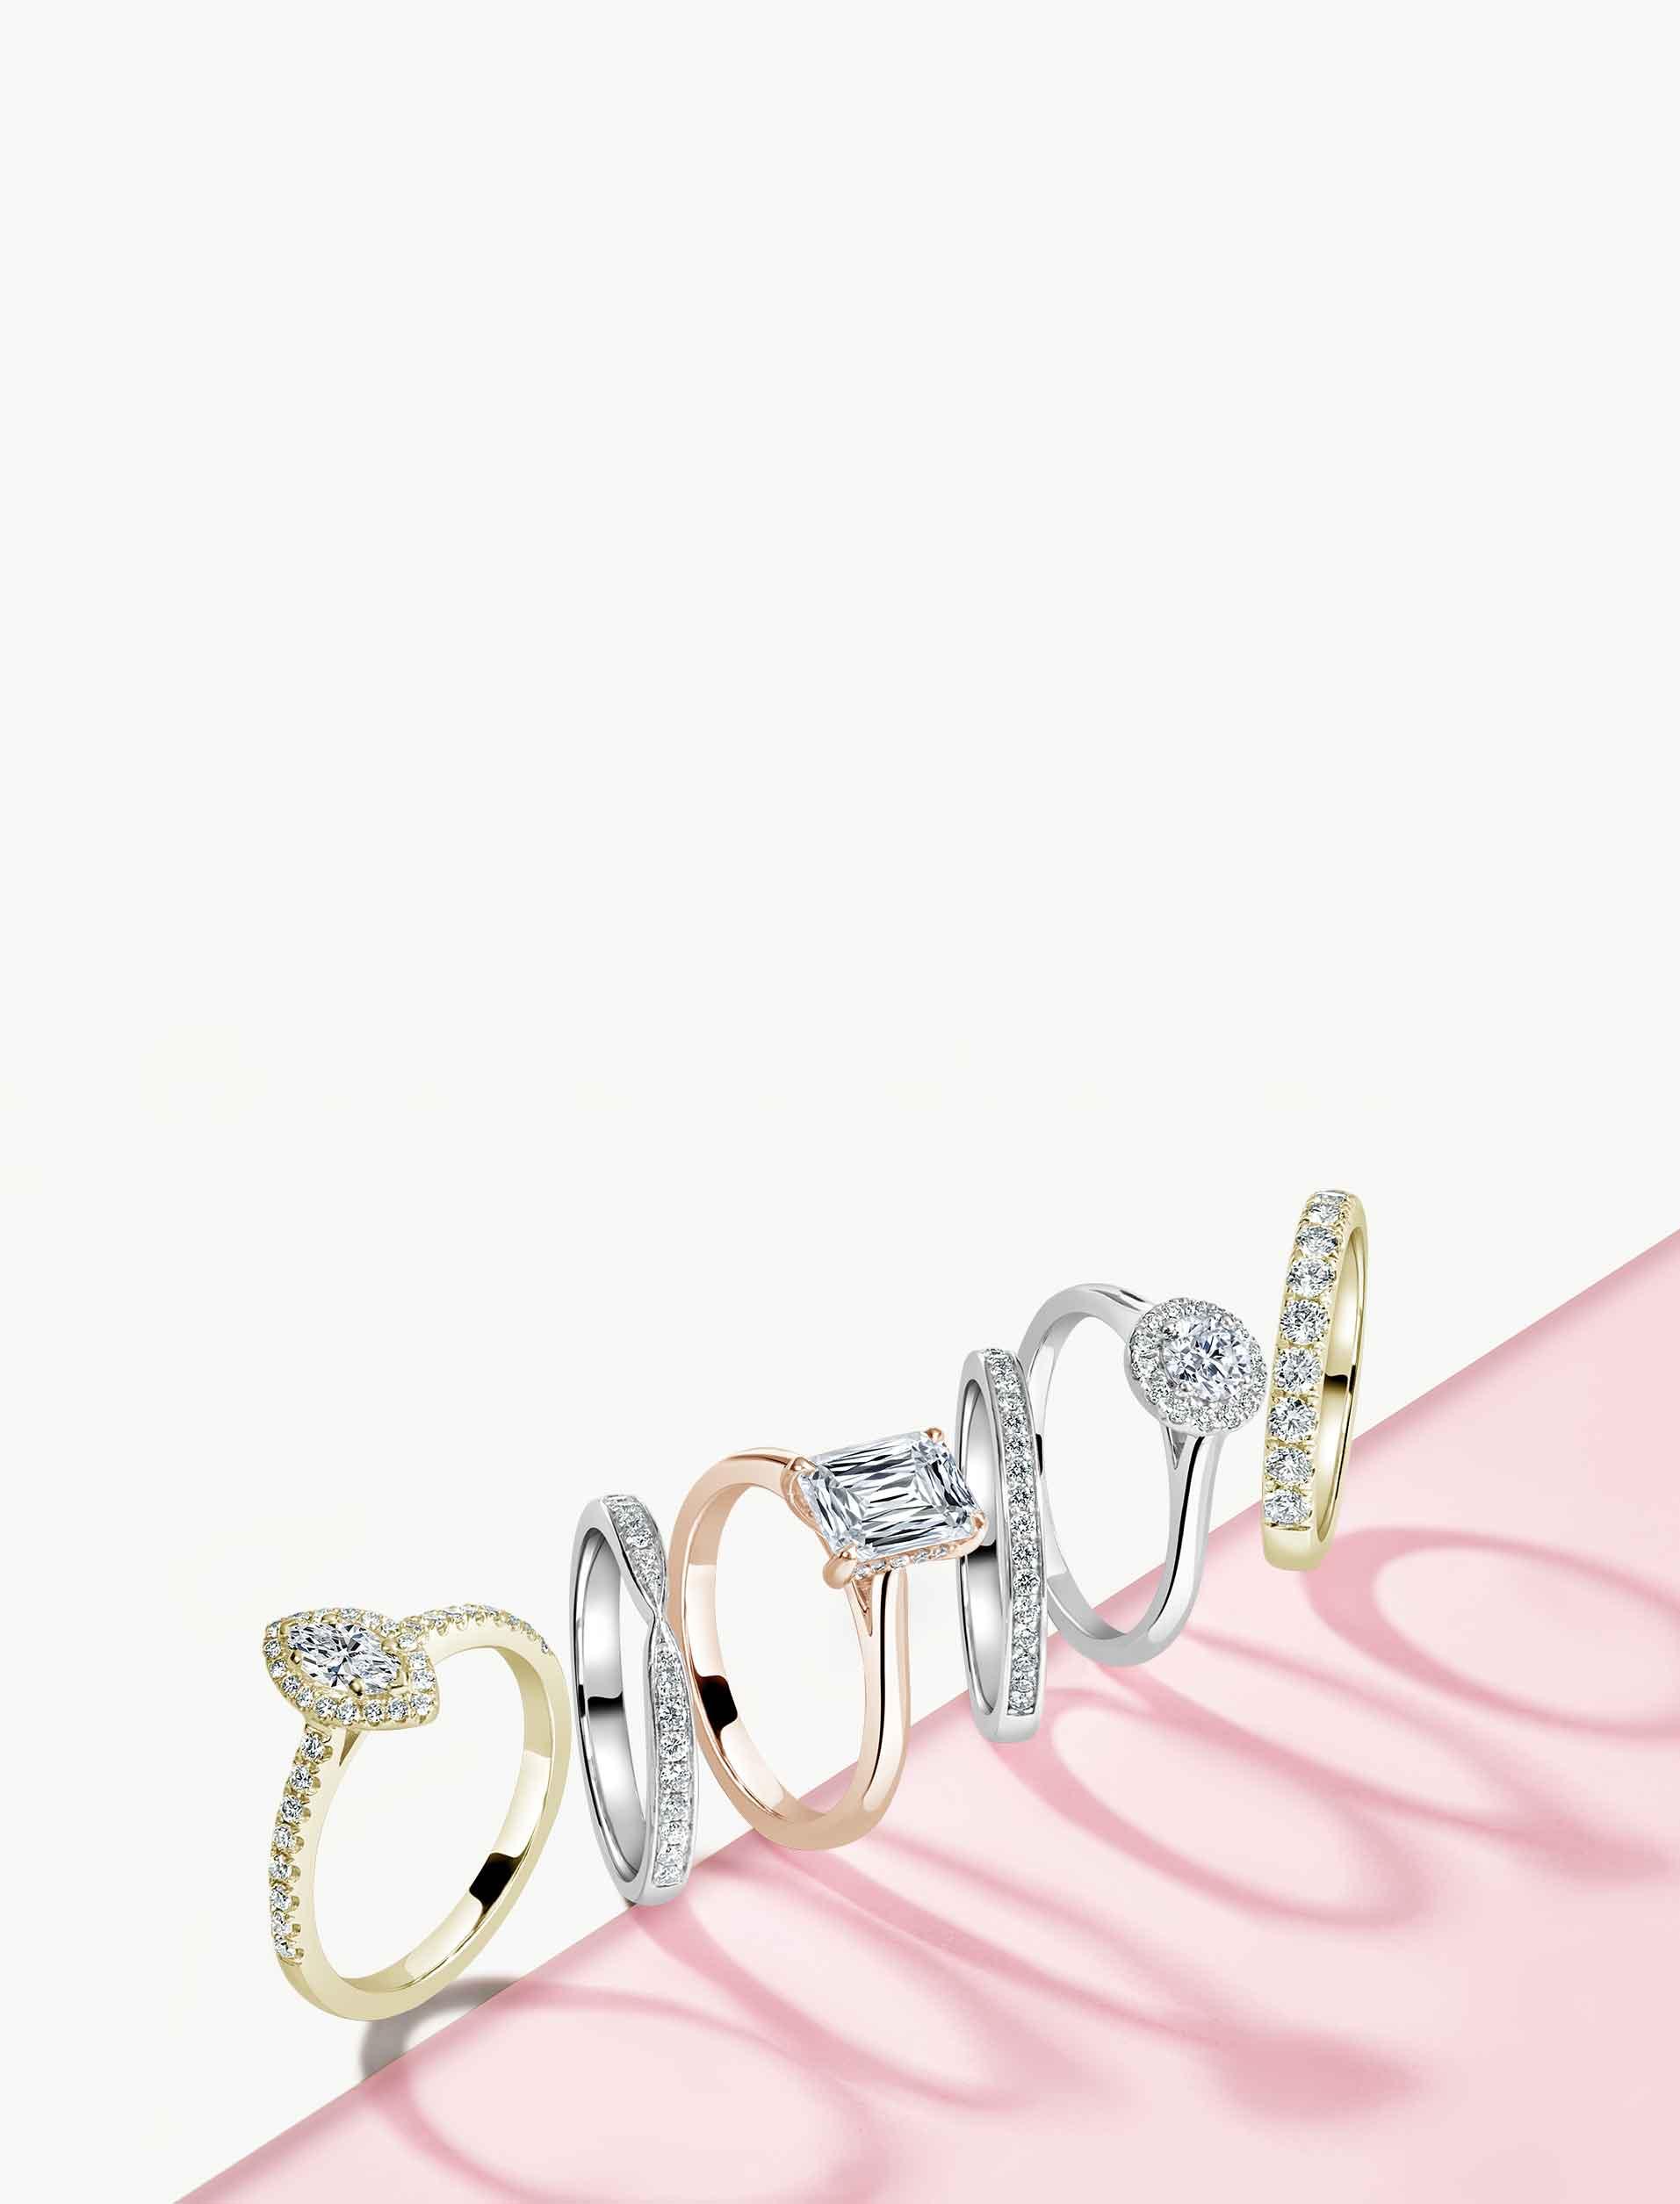 Princess Cut Diamond Engagement Rings - Steven Stone